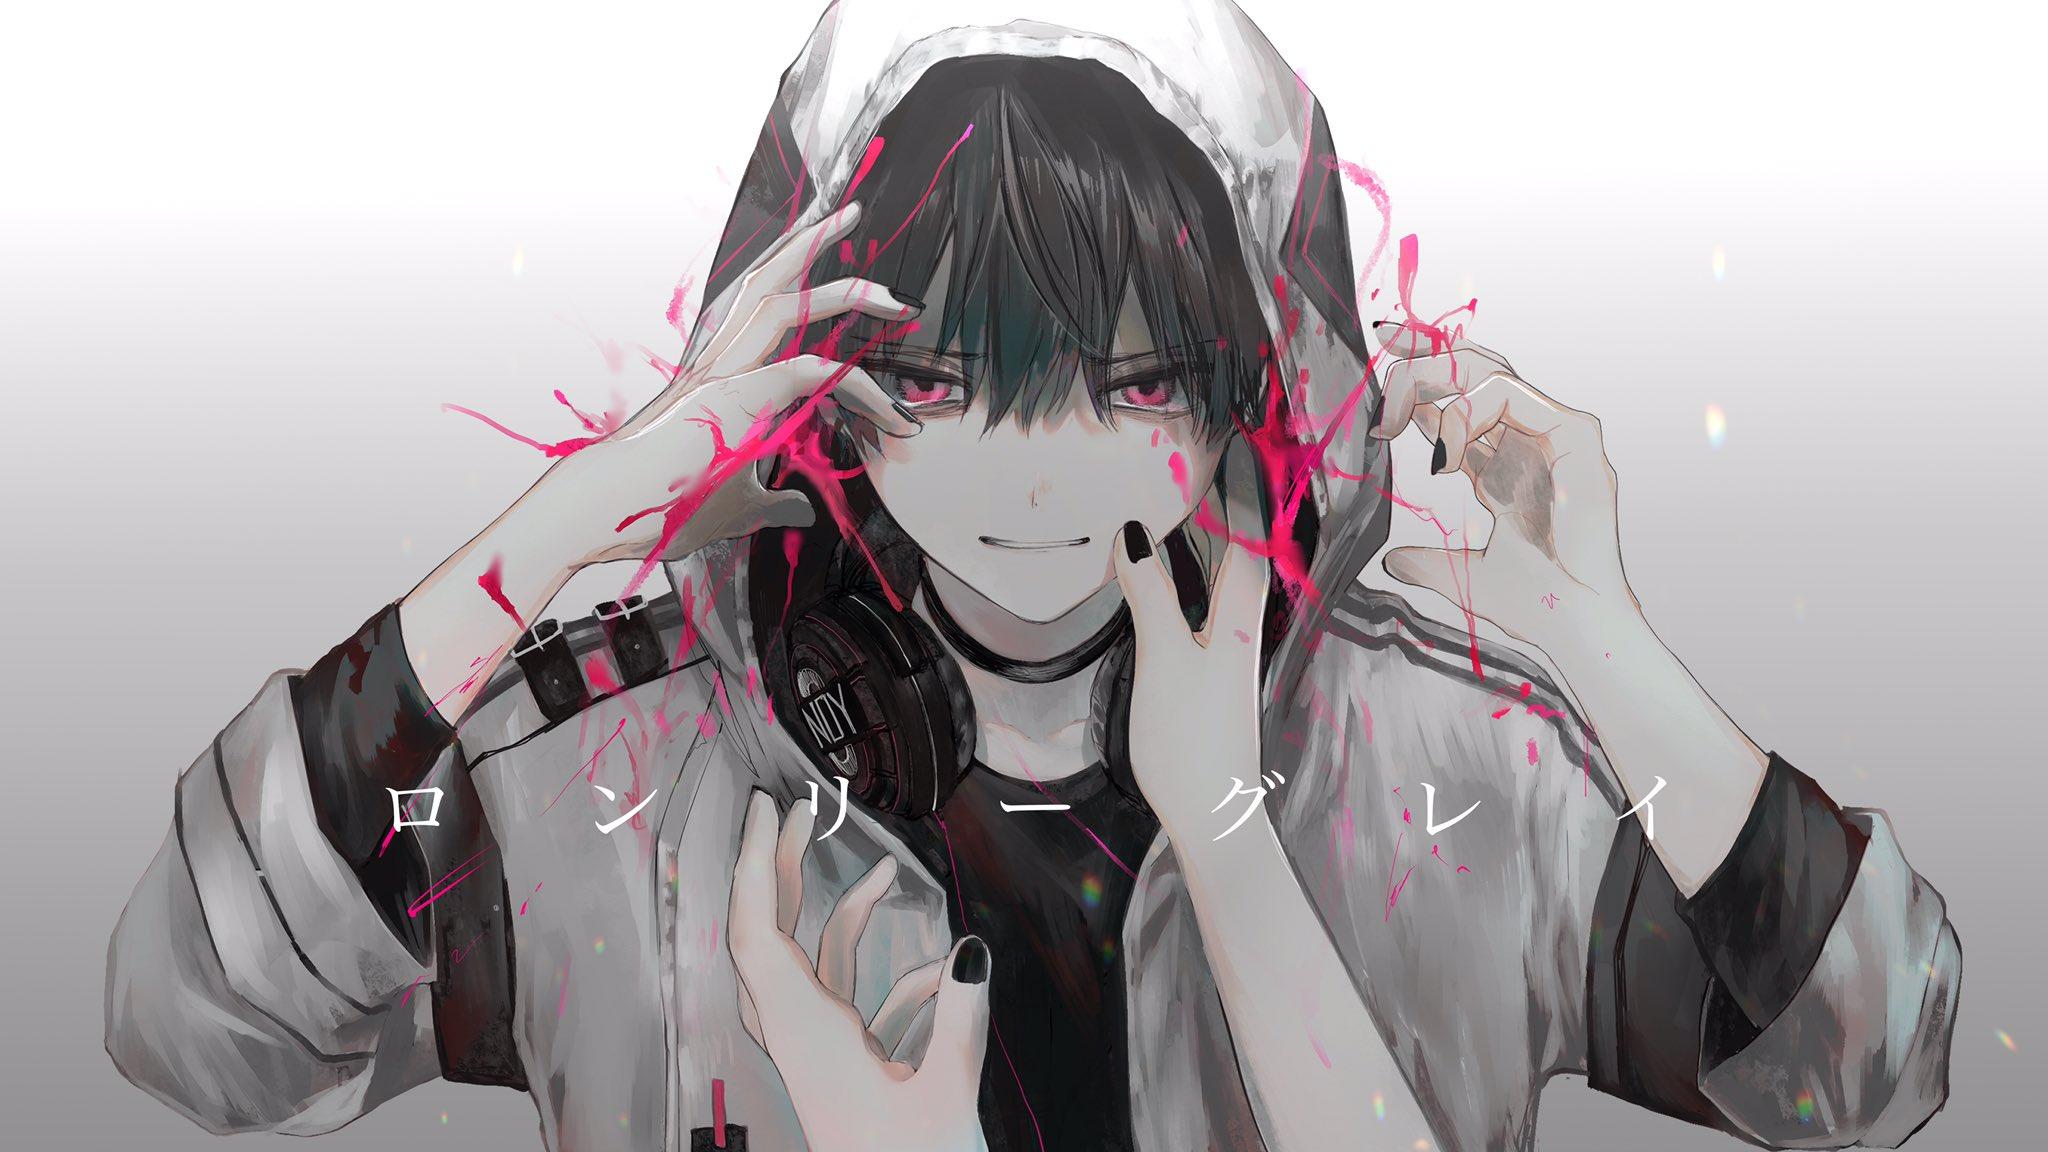 Anime Male Headphones Black Nails Hood 2048x1152